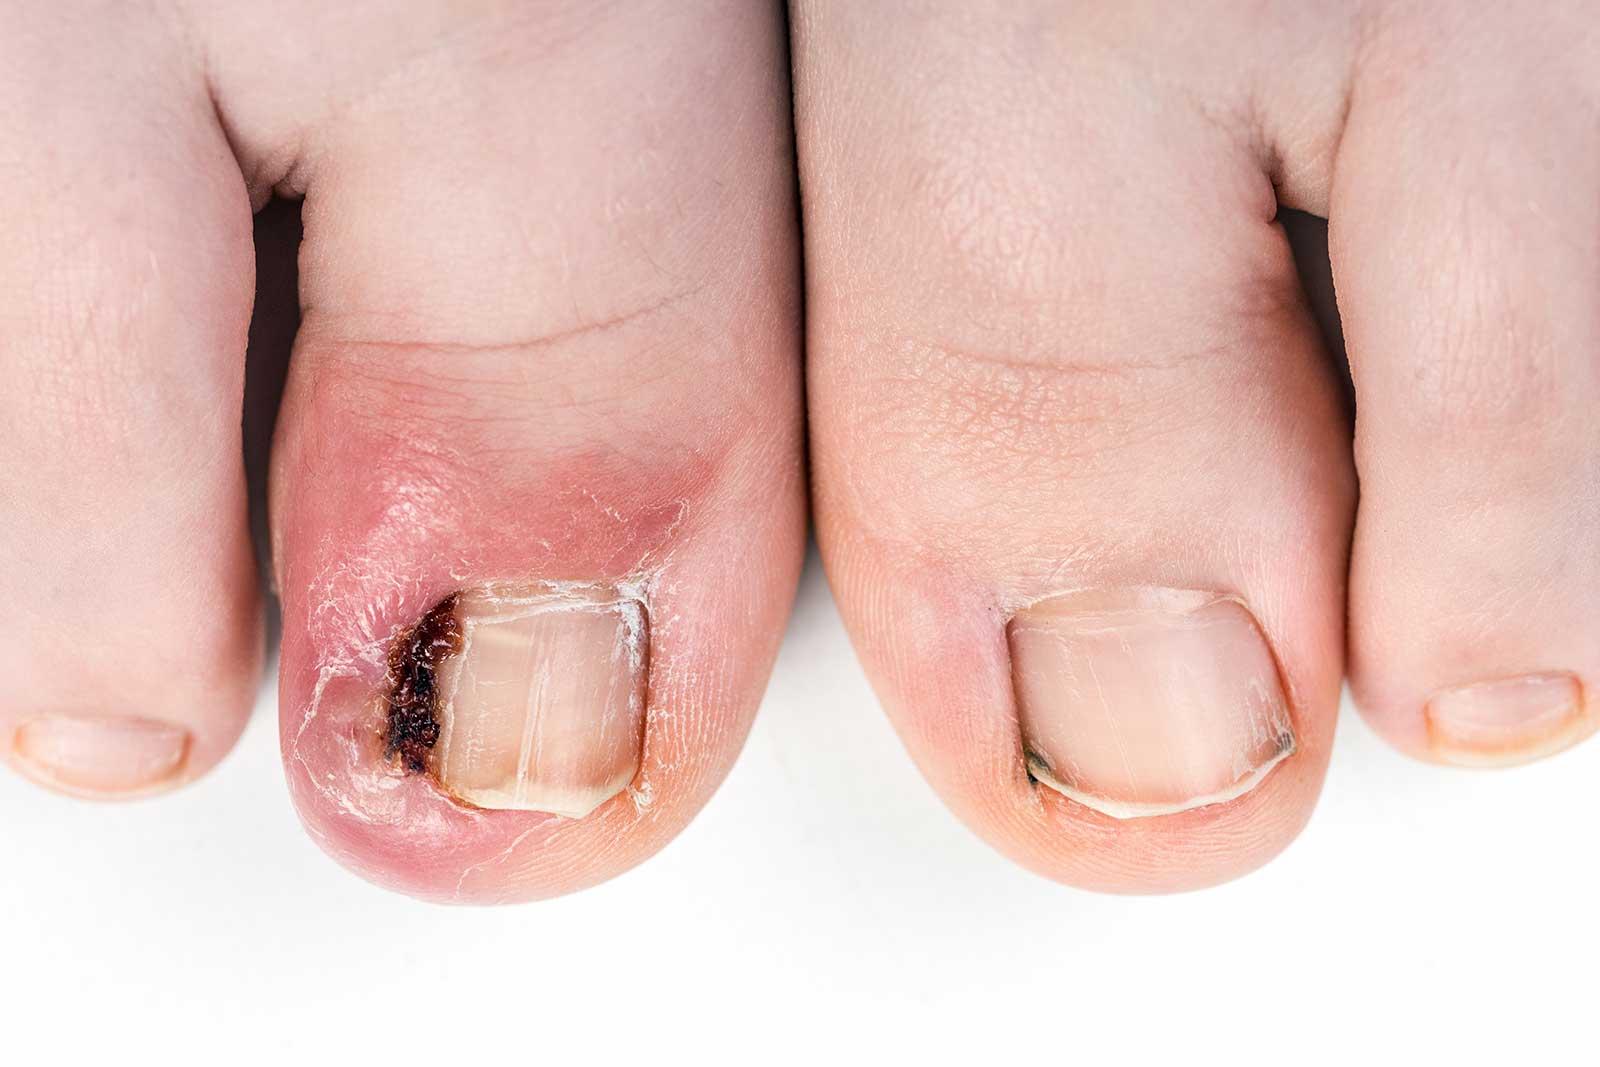 Treatment for ingrowing toenails